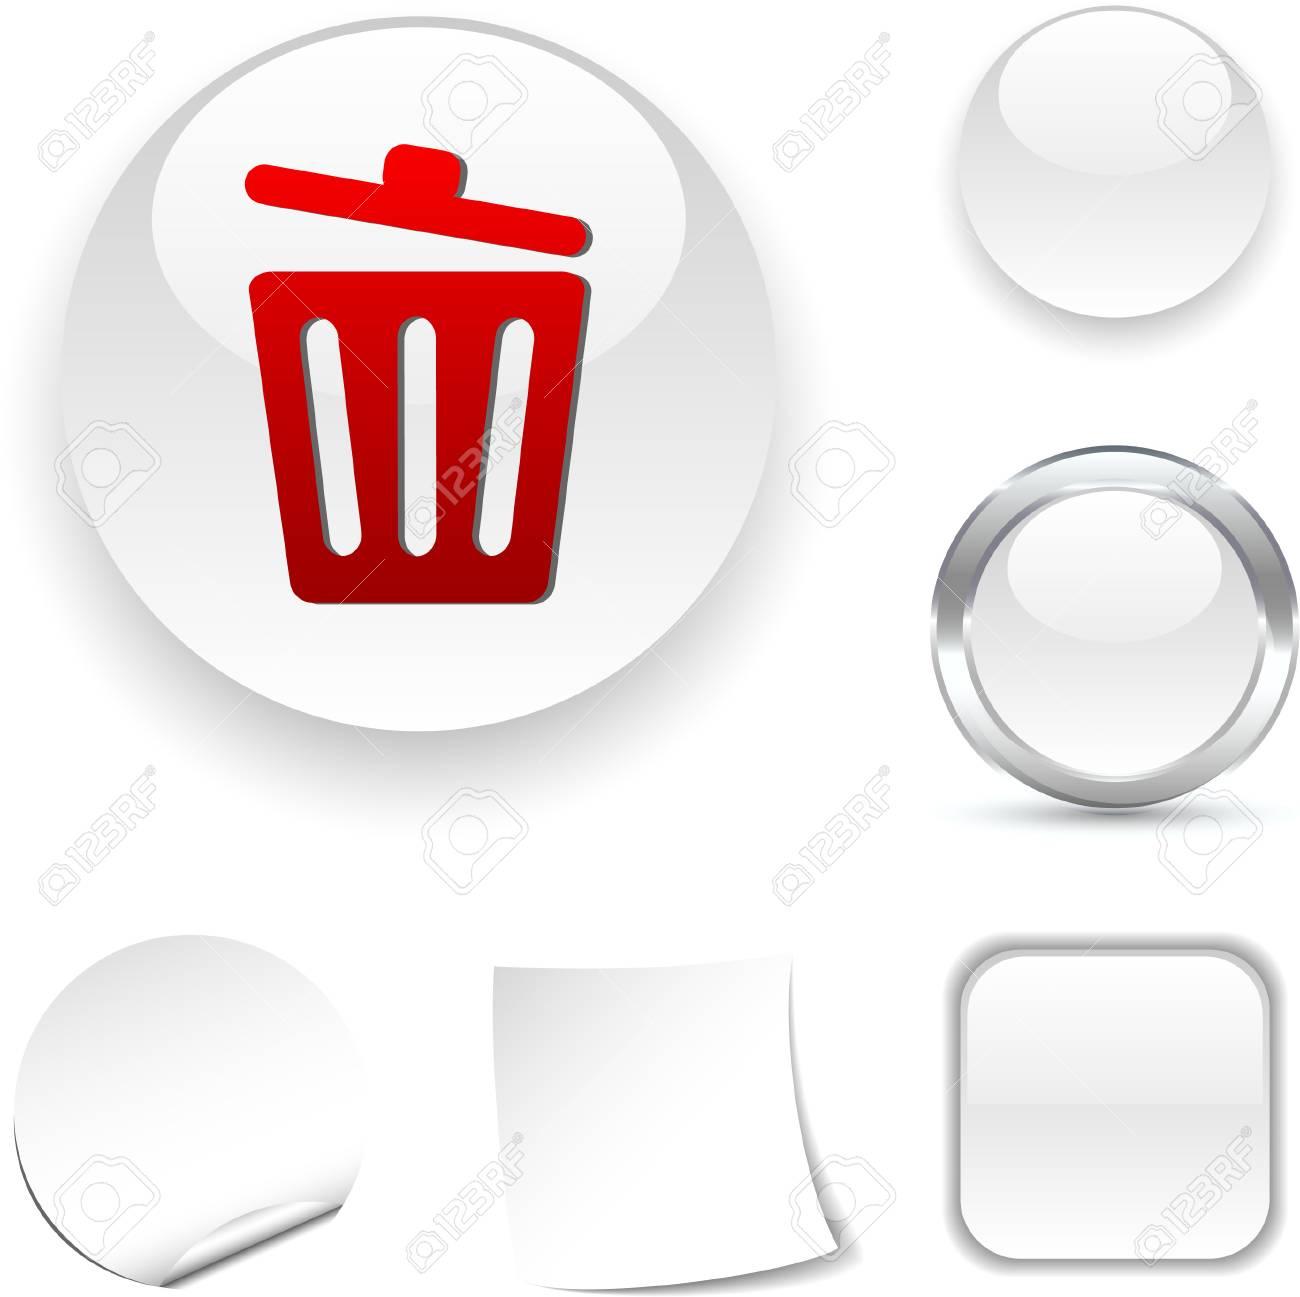 Recycle bin.  white icon. Vector illustration. Stock Vector - 5509033